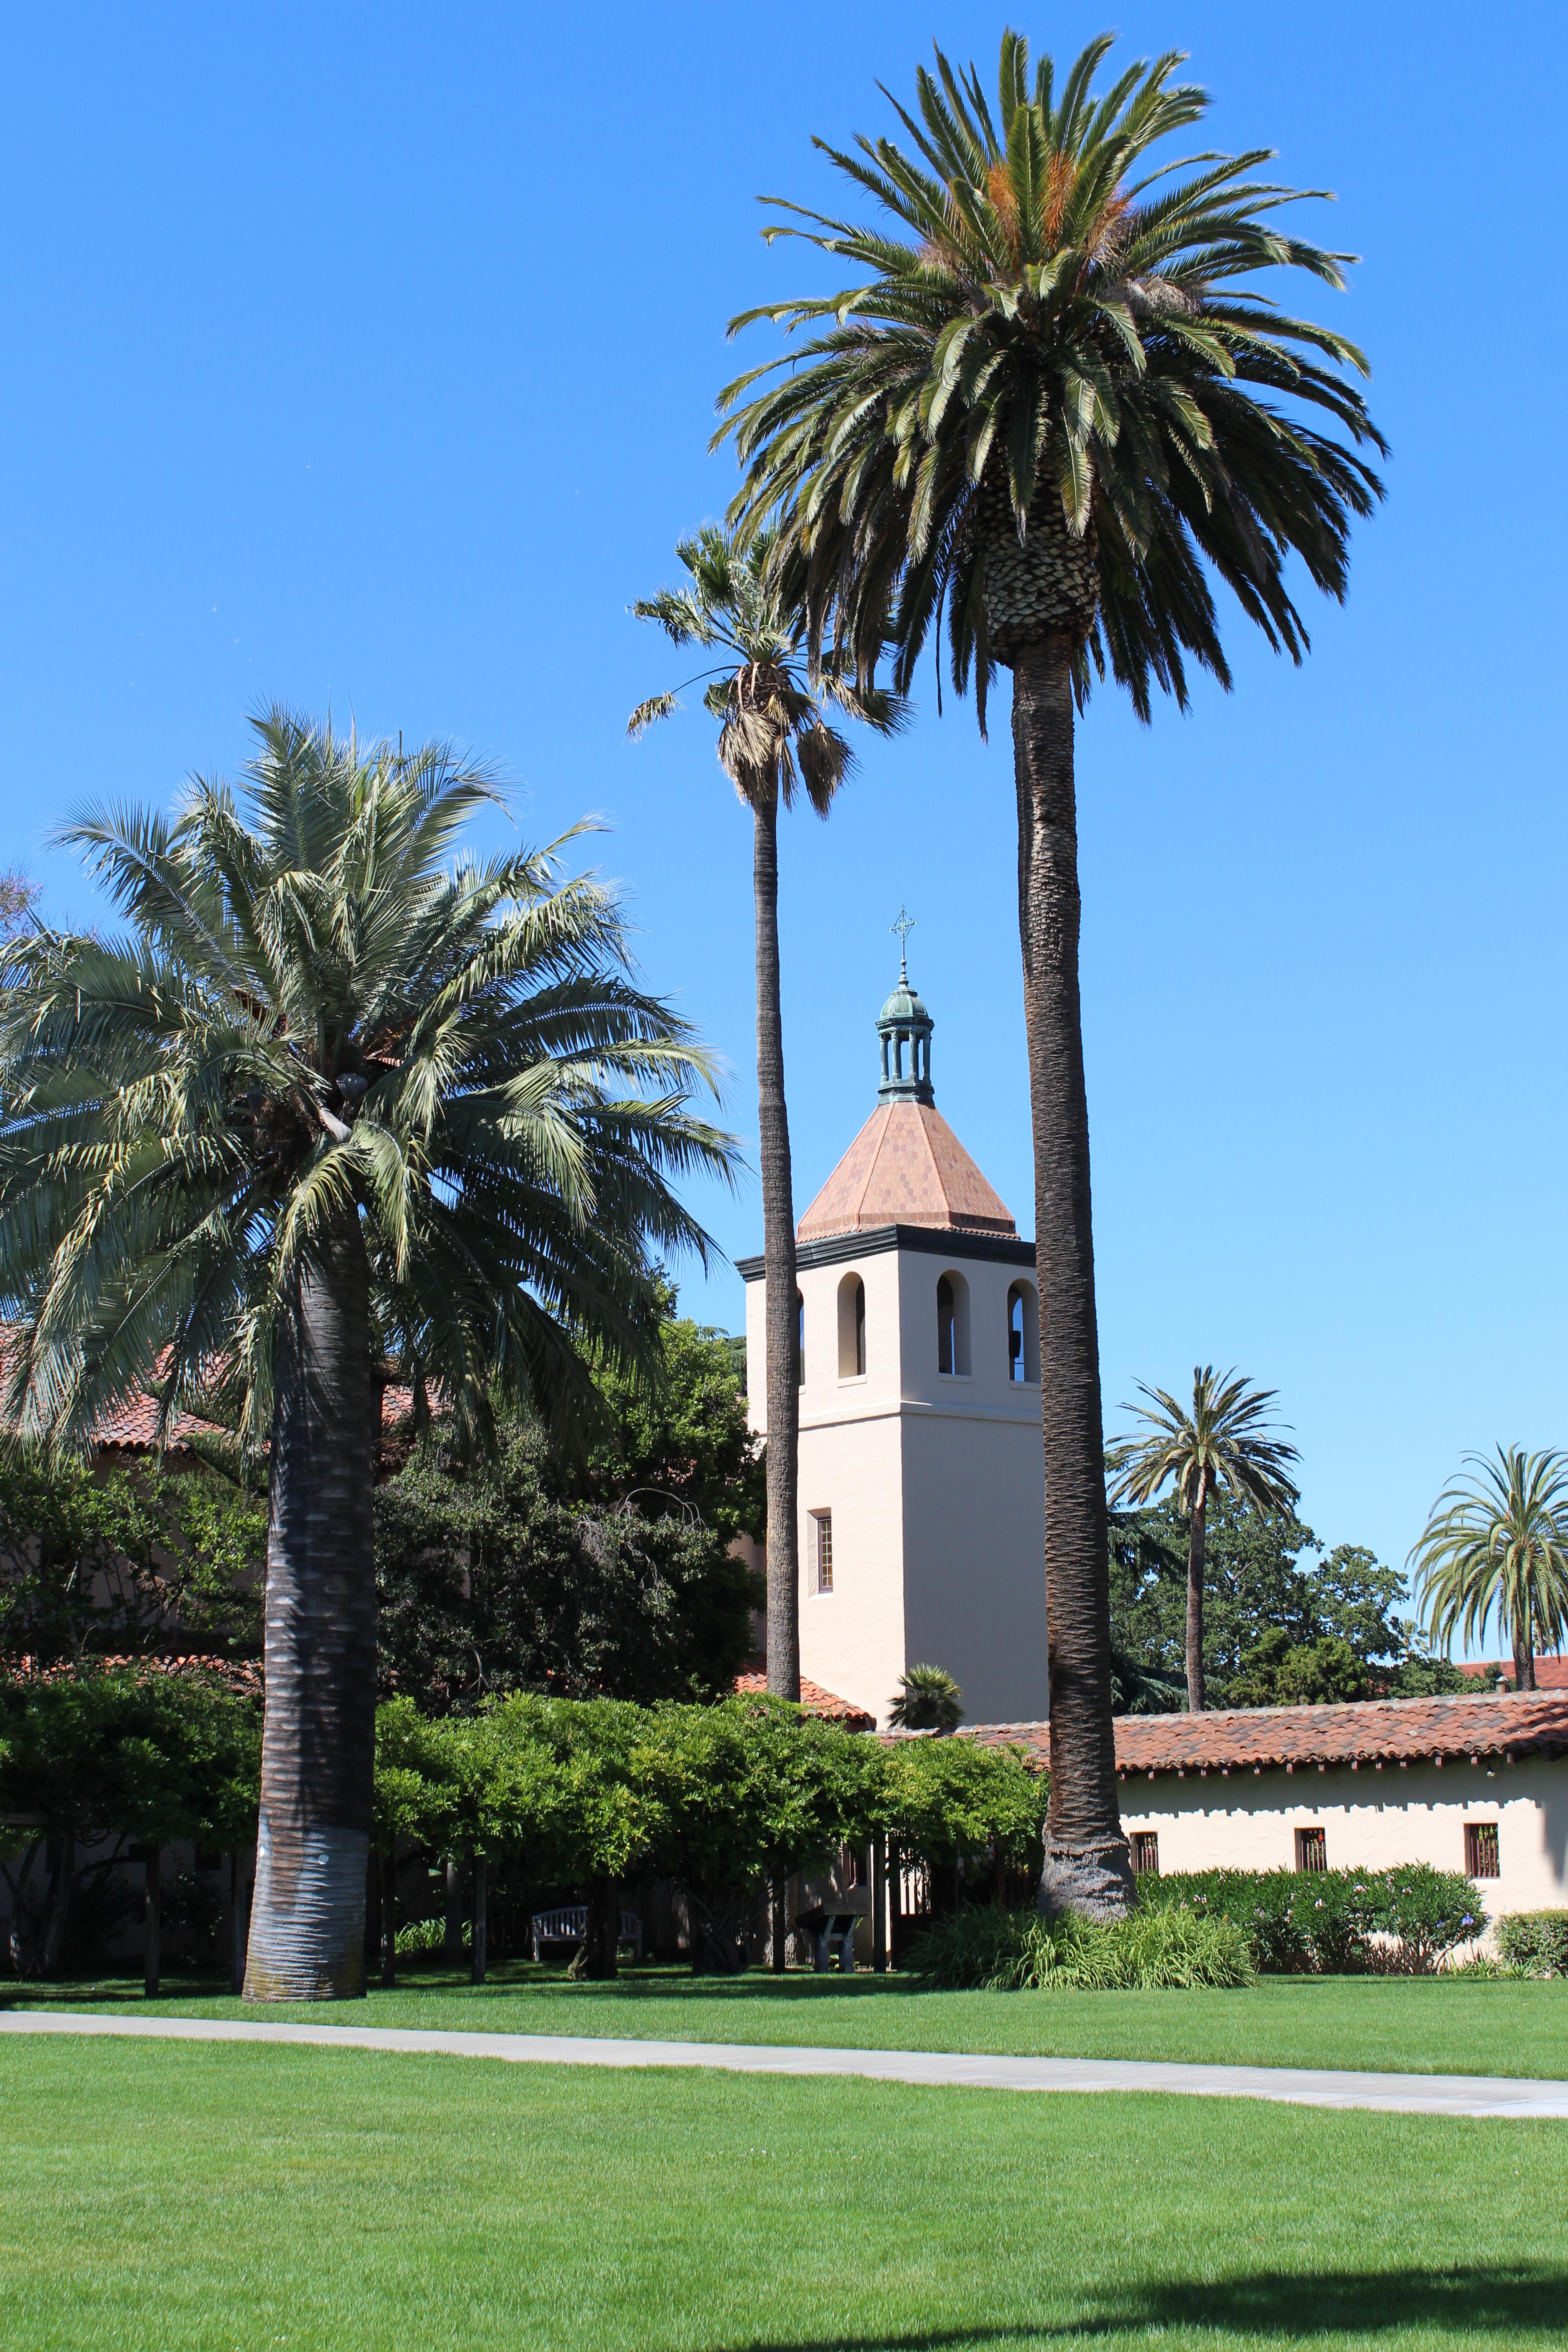 Santa Clara πανεπιστήμιο dating